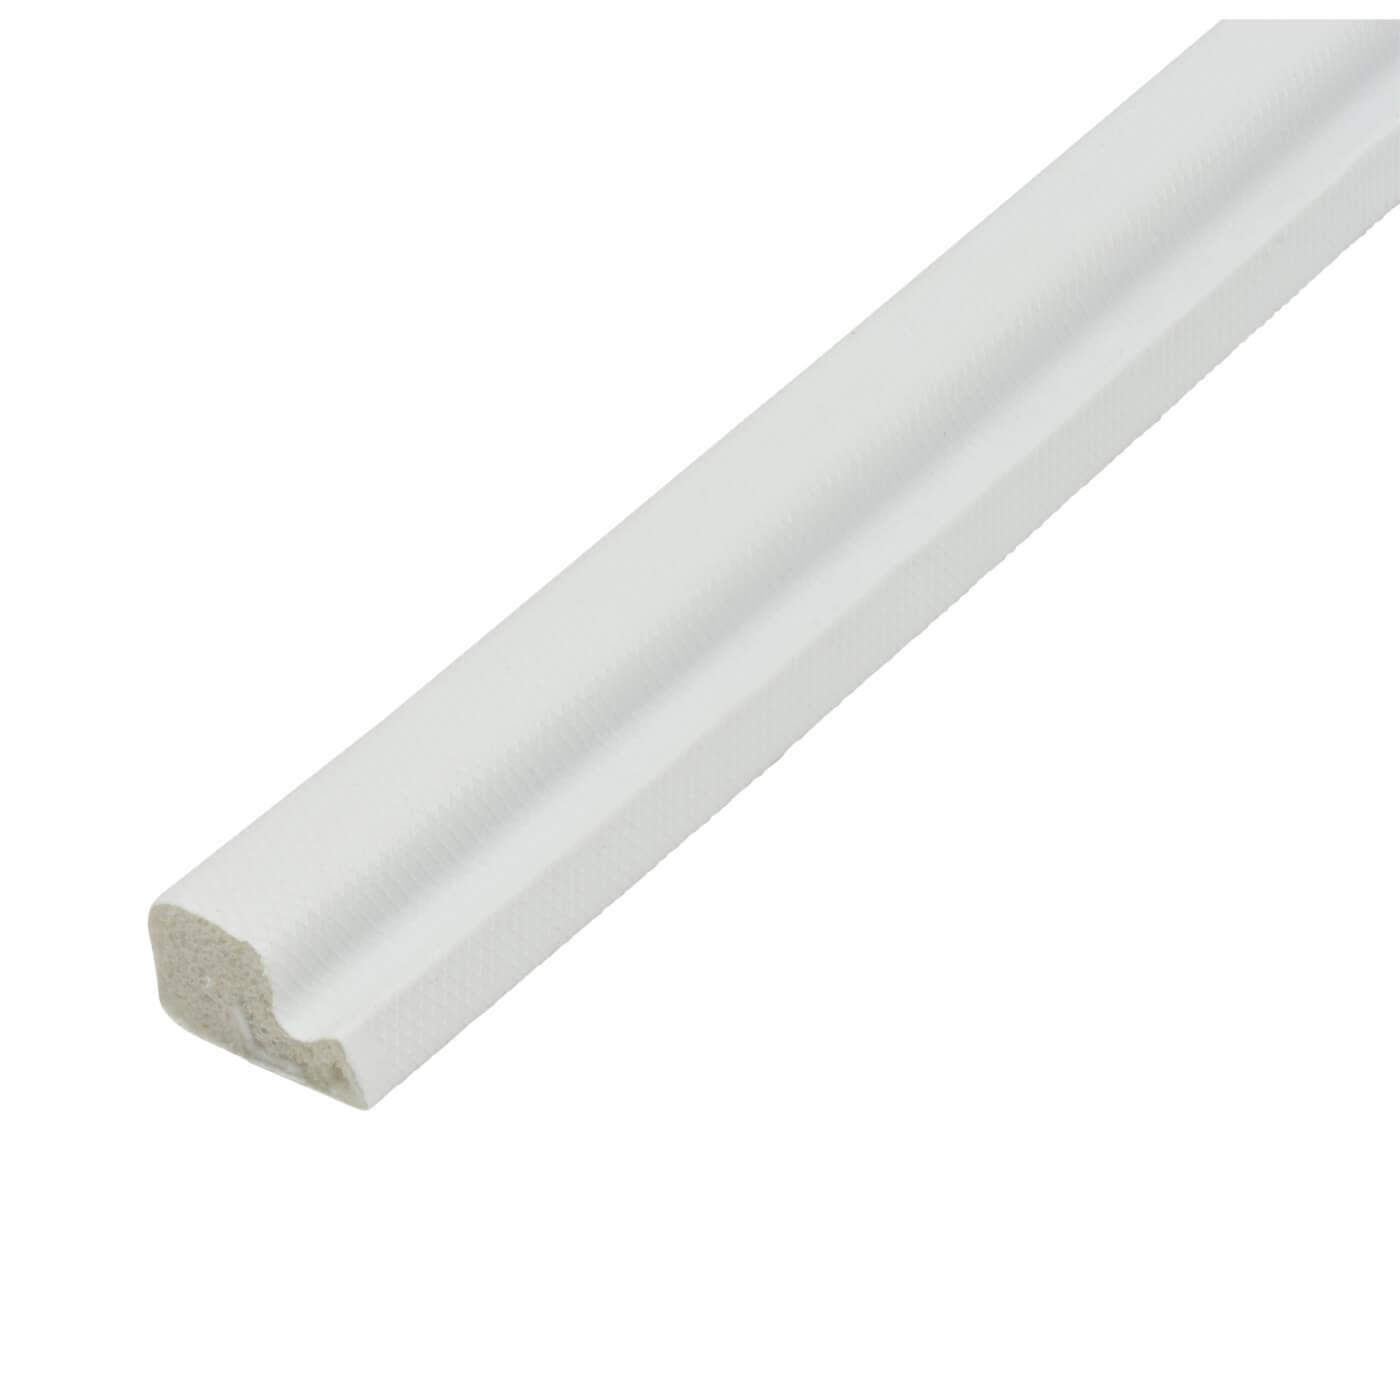 Schlegel AQ63 (QL3005) Aquamac Seal - 100 metres - White)